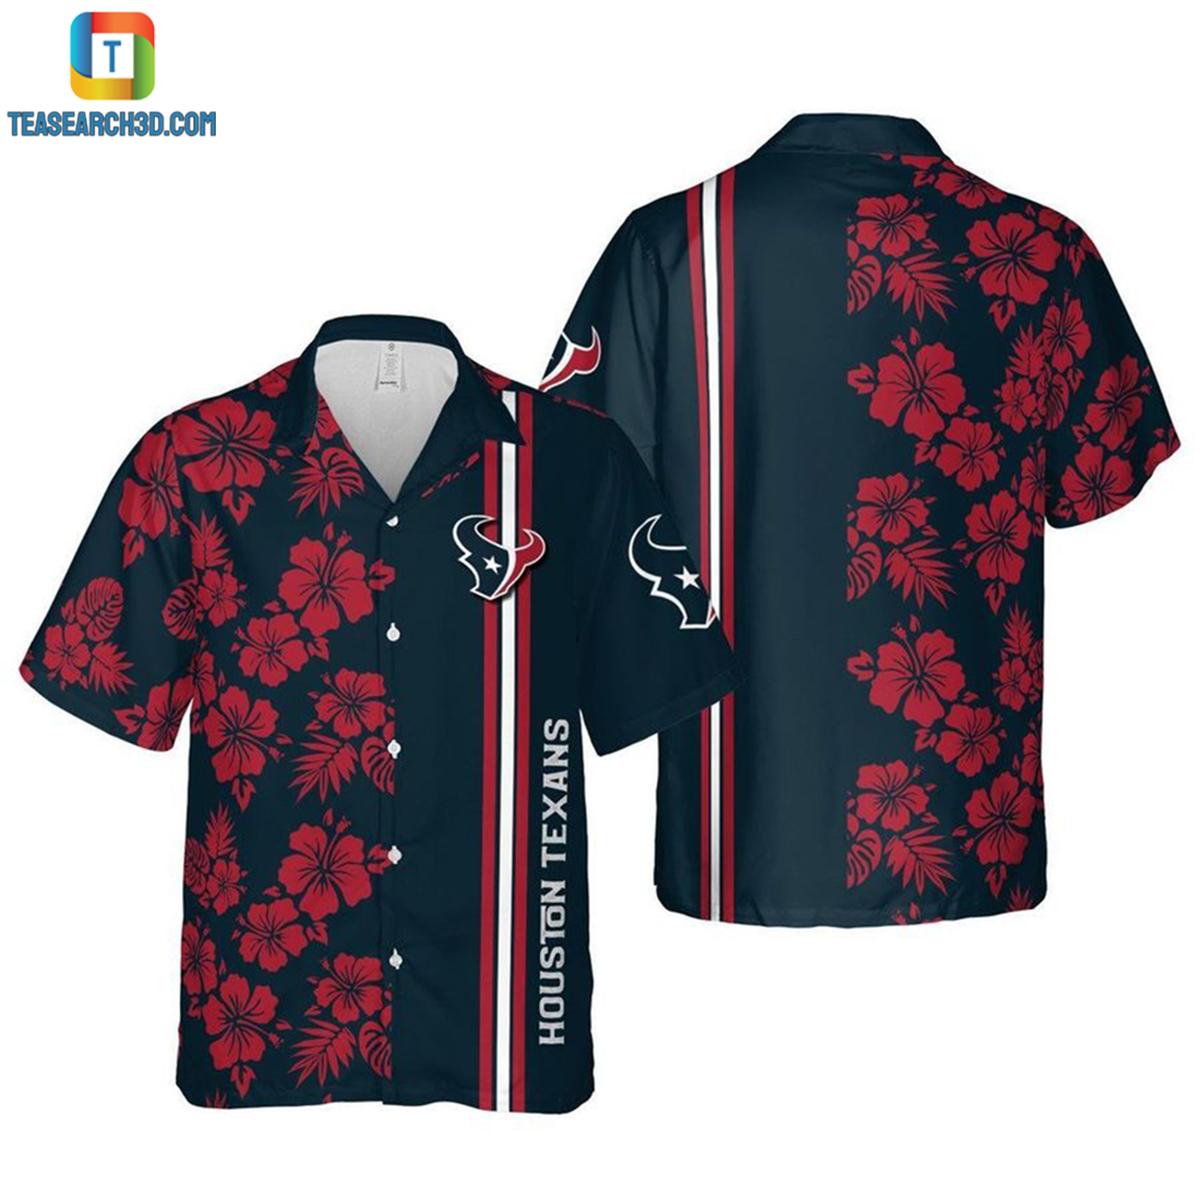 Houston texans floral nfl football hawaiian shirt 2